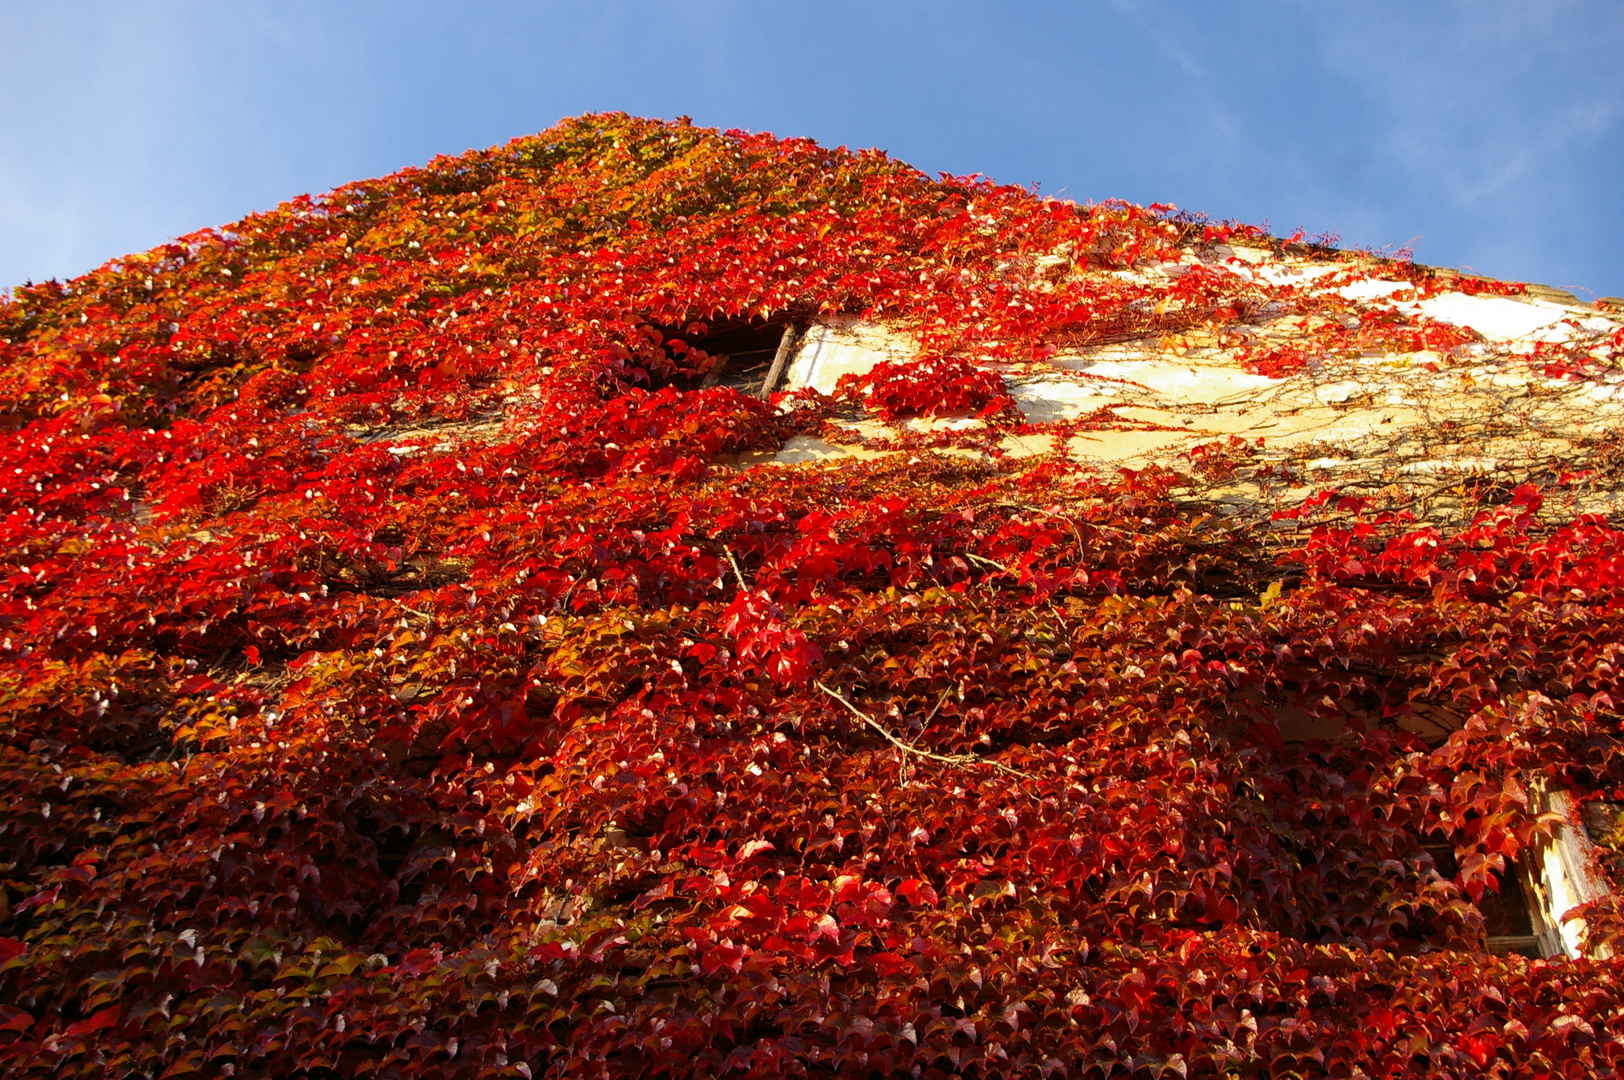 Hausfassade in Rot